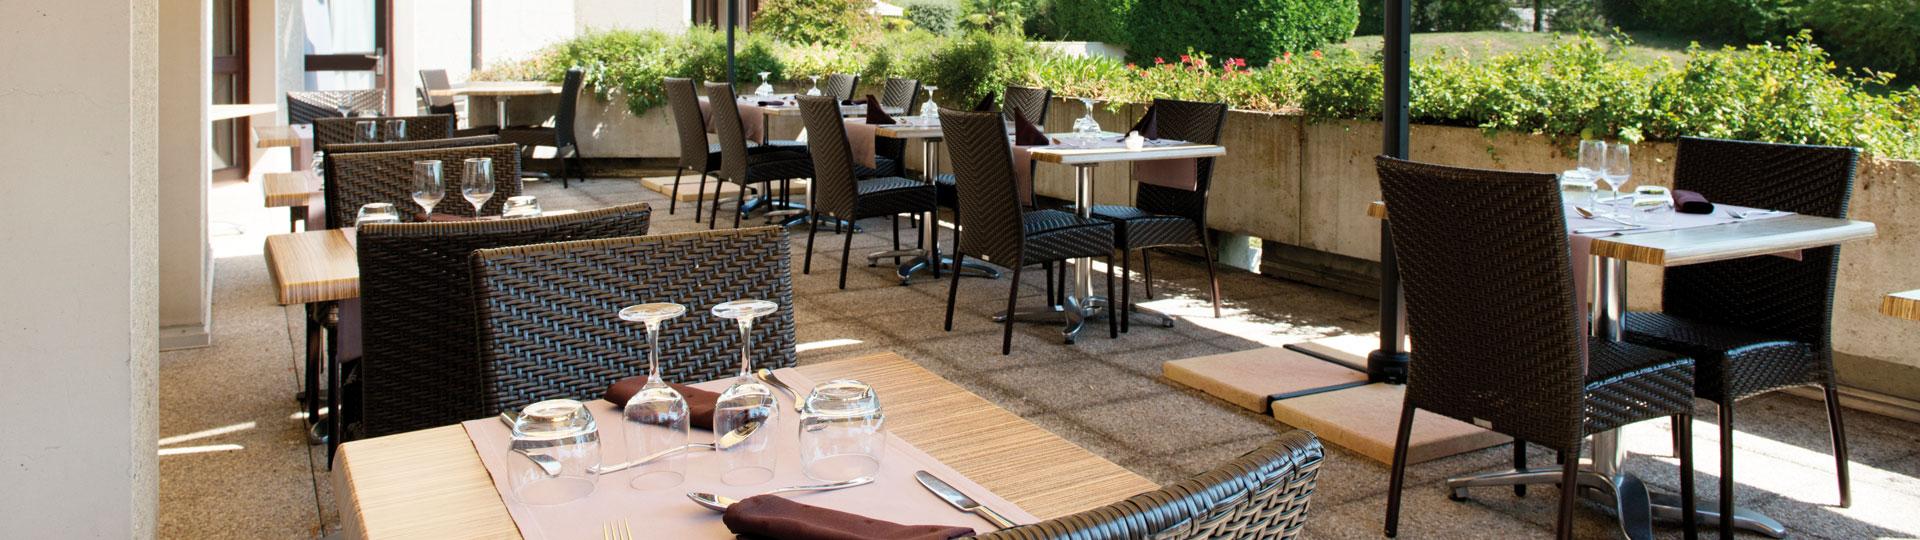 Restaurant Villa Marlioz